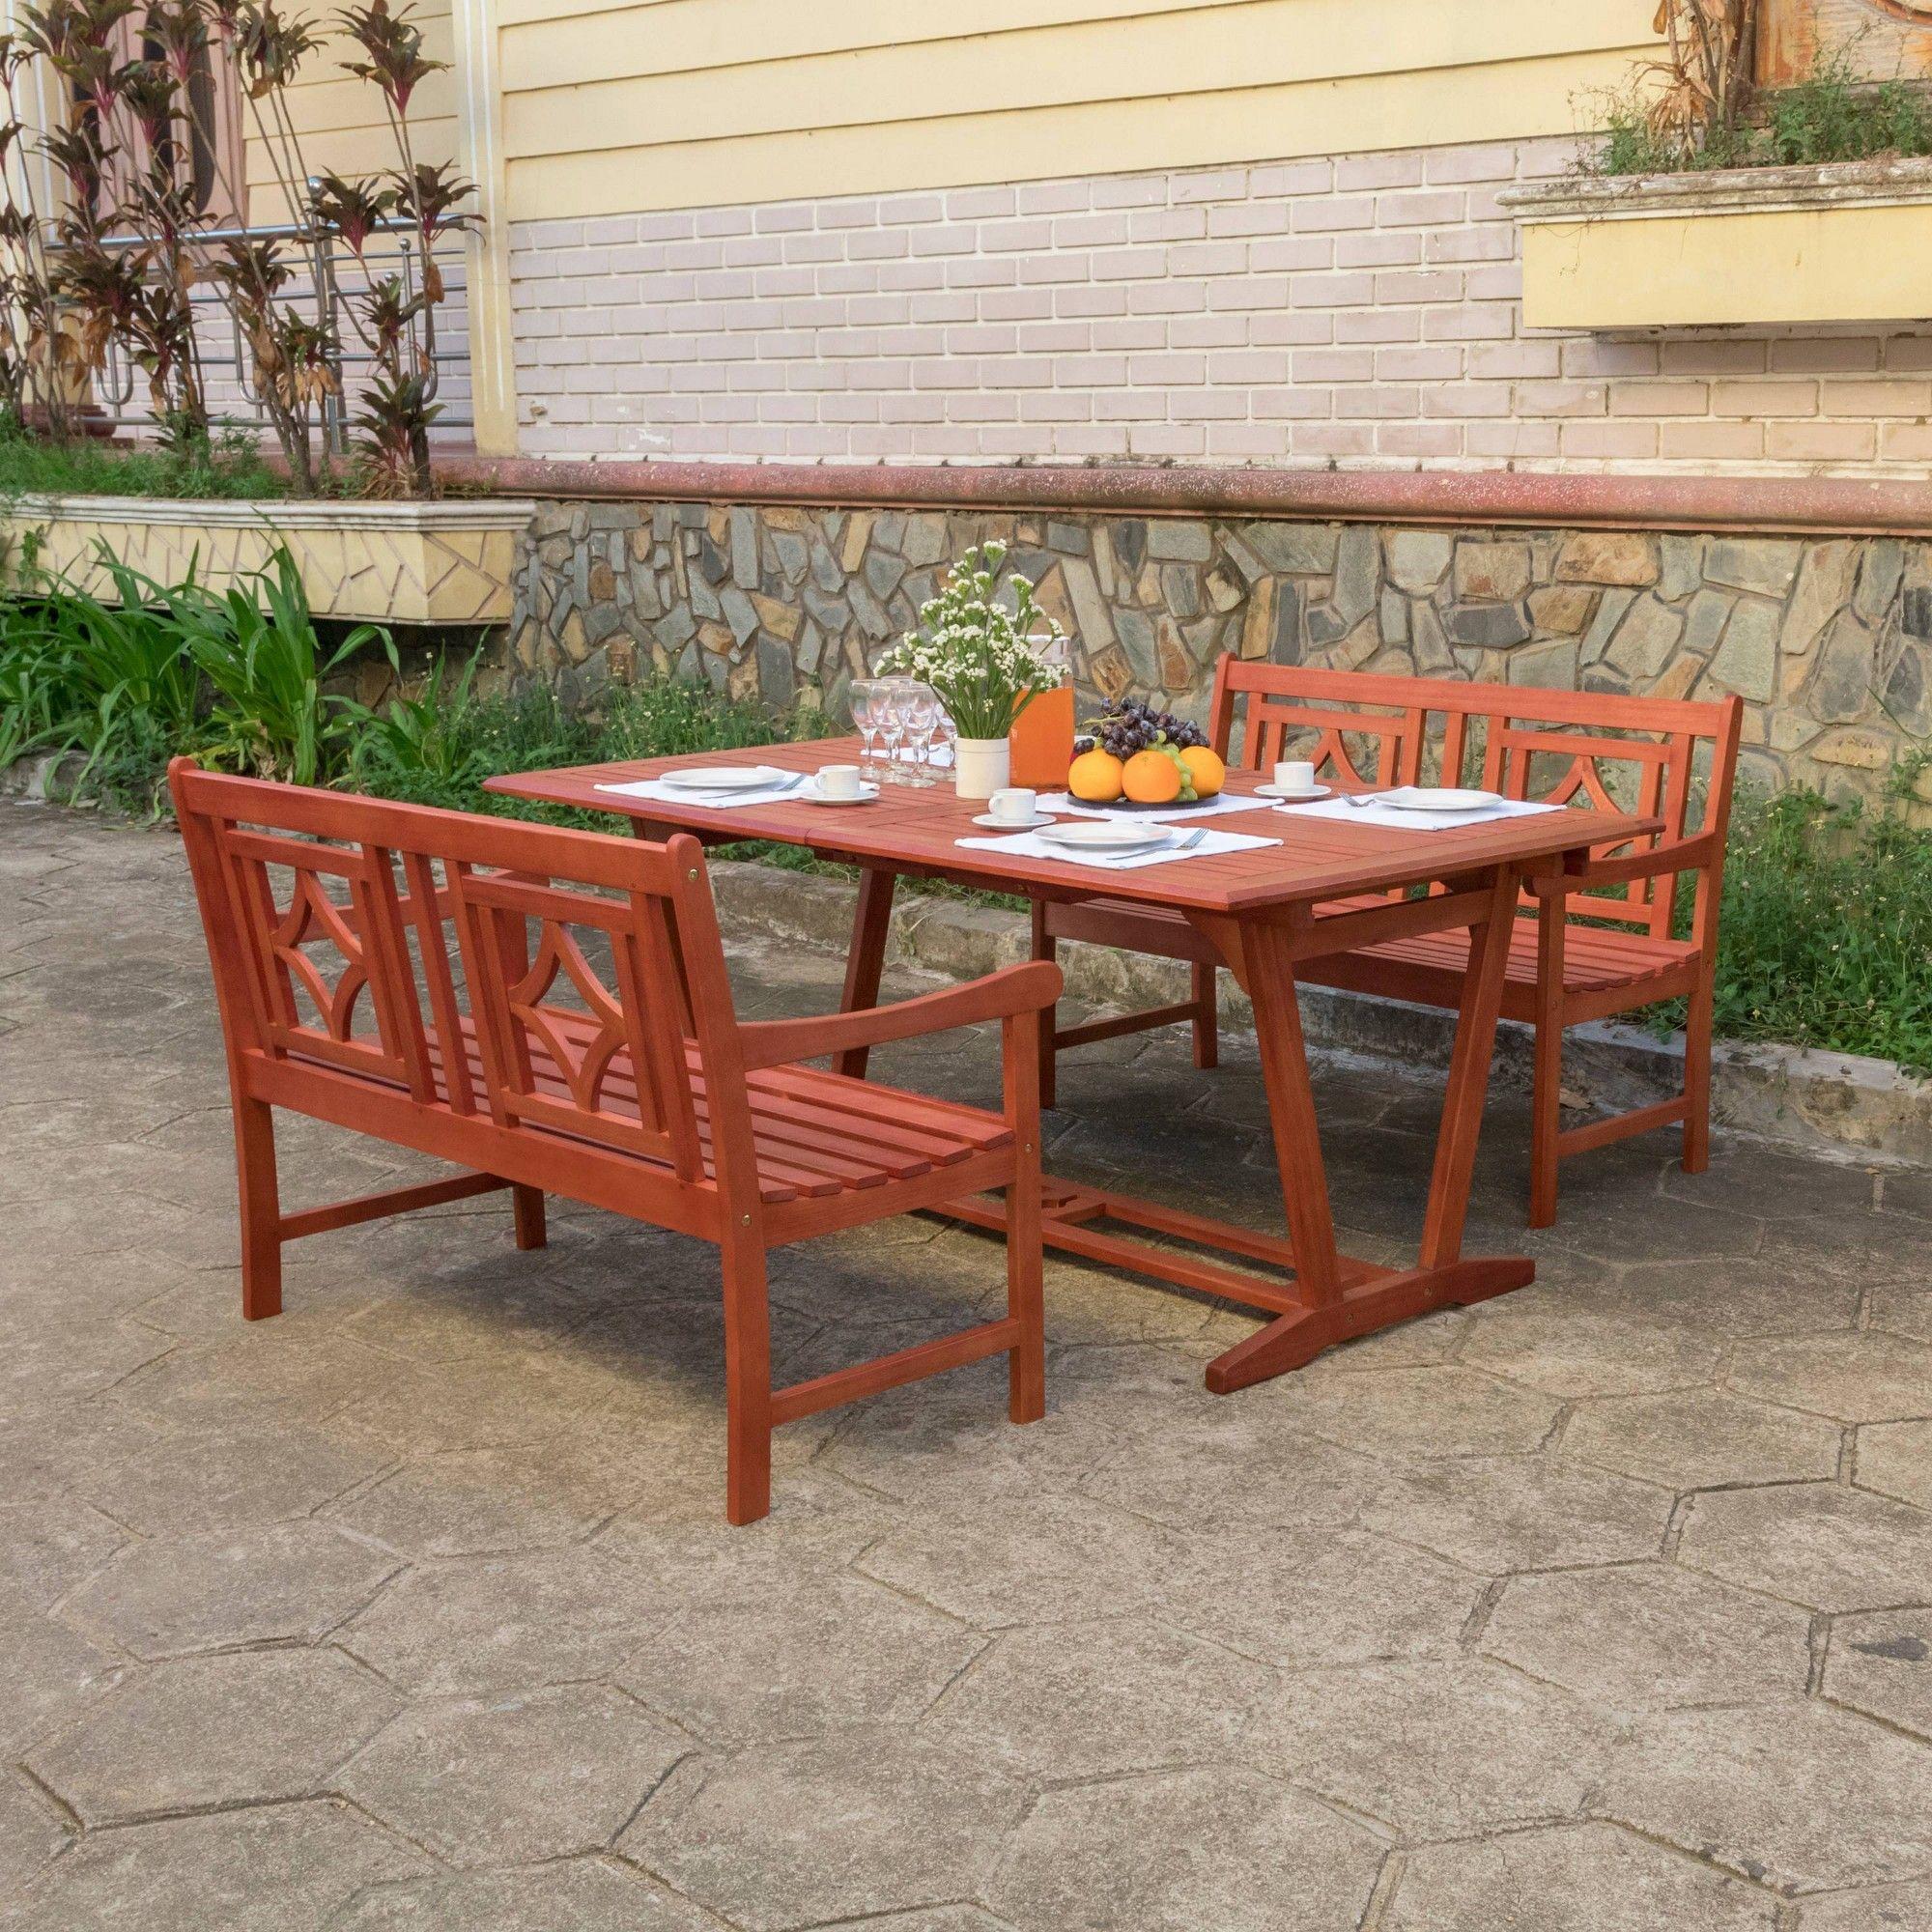 Vifah Patio Furniture.Malibu 3pc Wood Extendable Outdoor Patio Dining Set Tan Vifah In